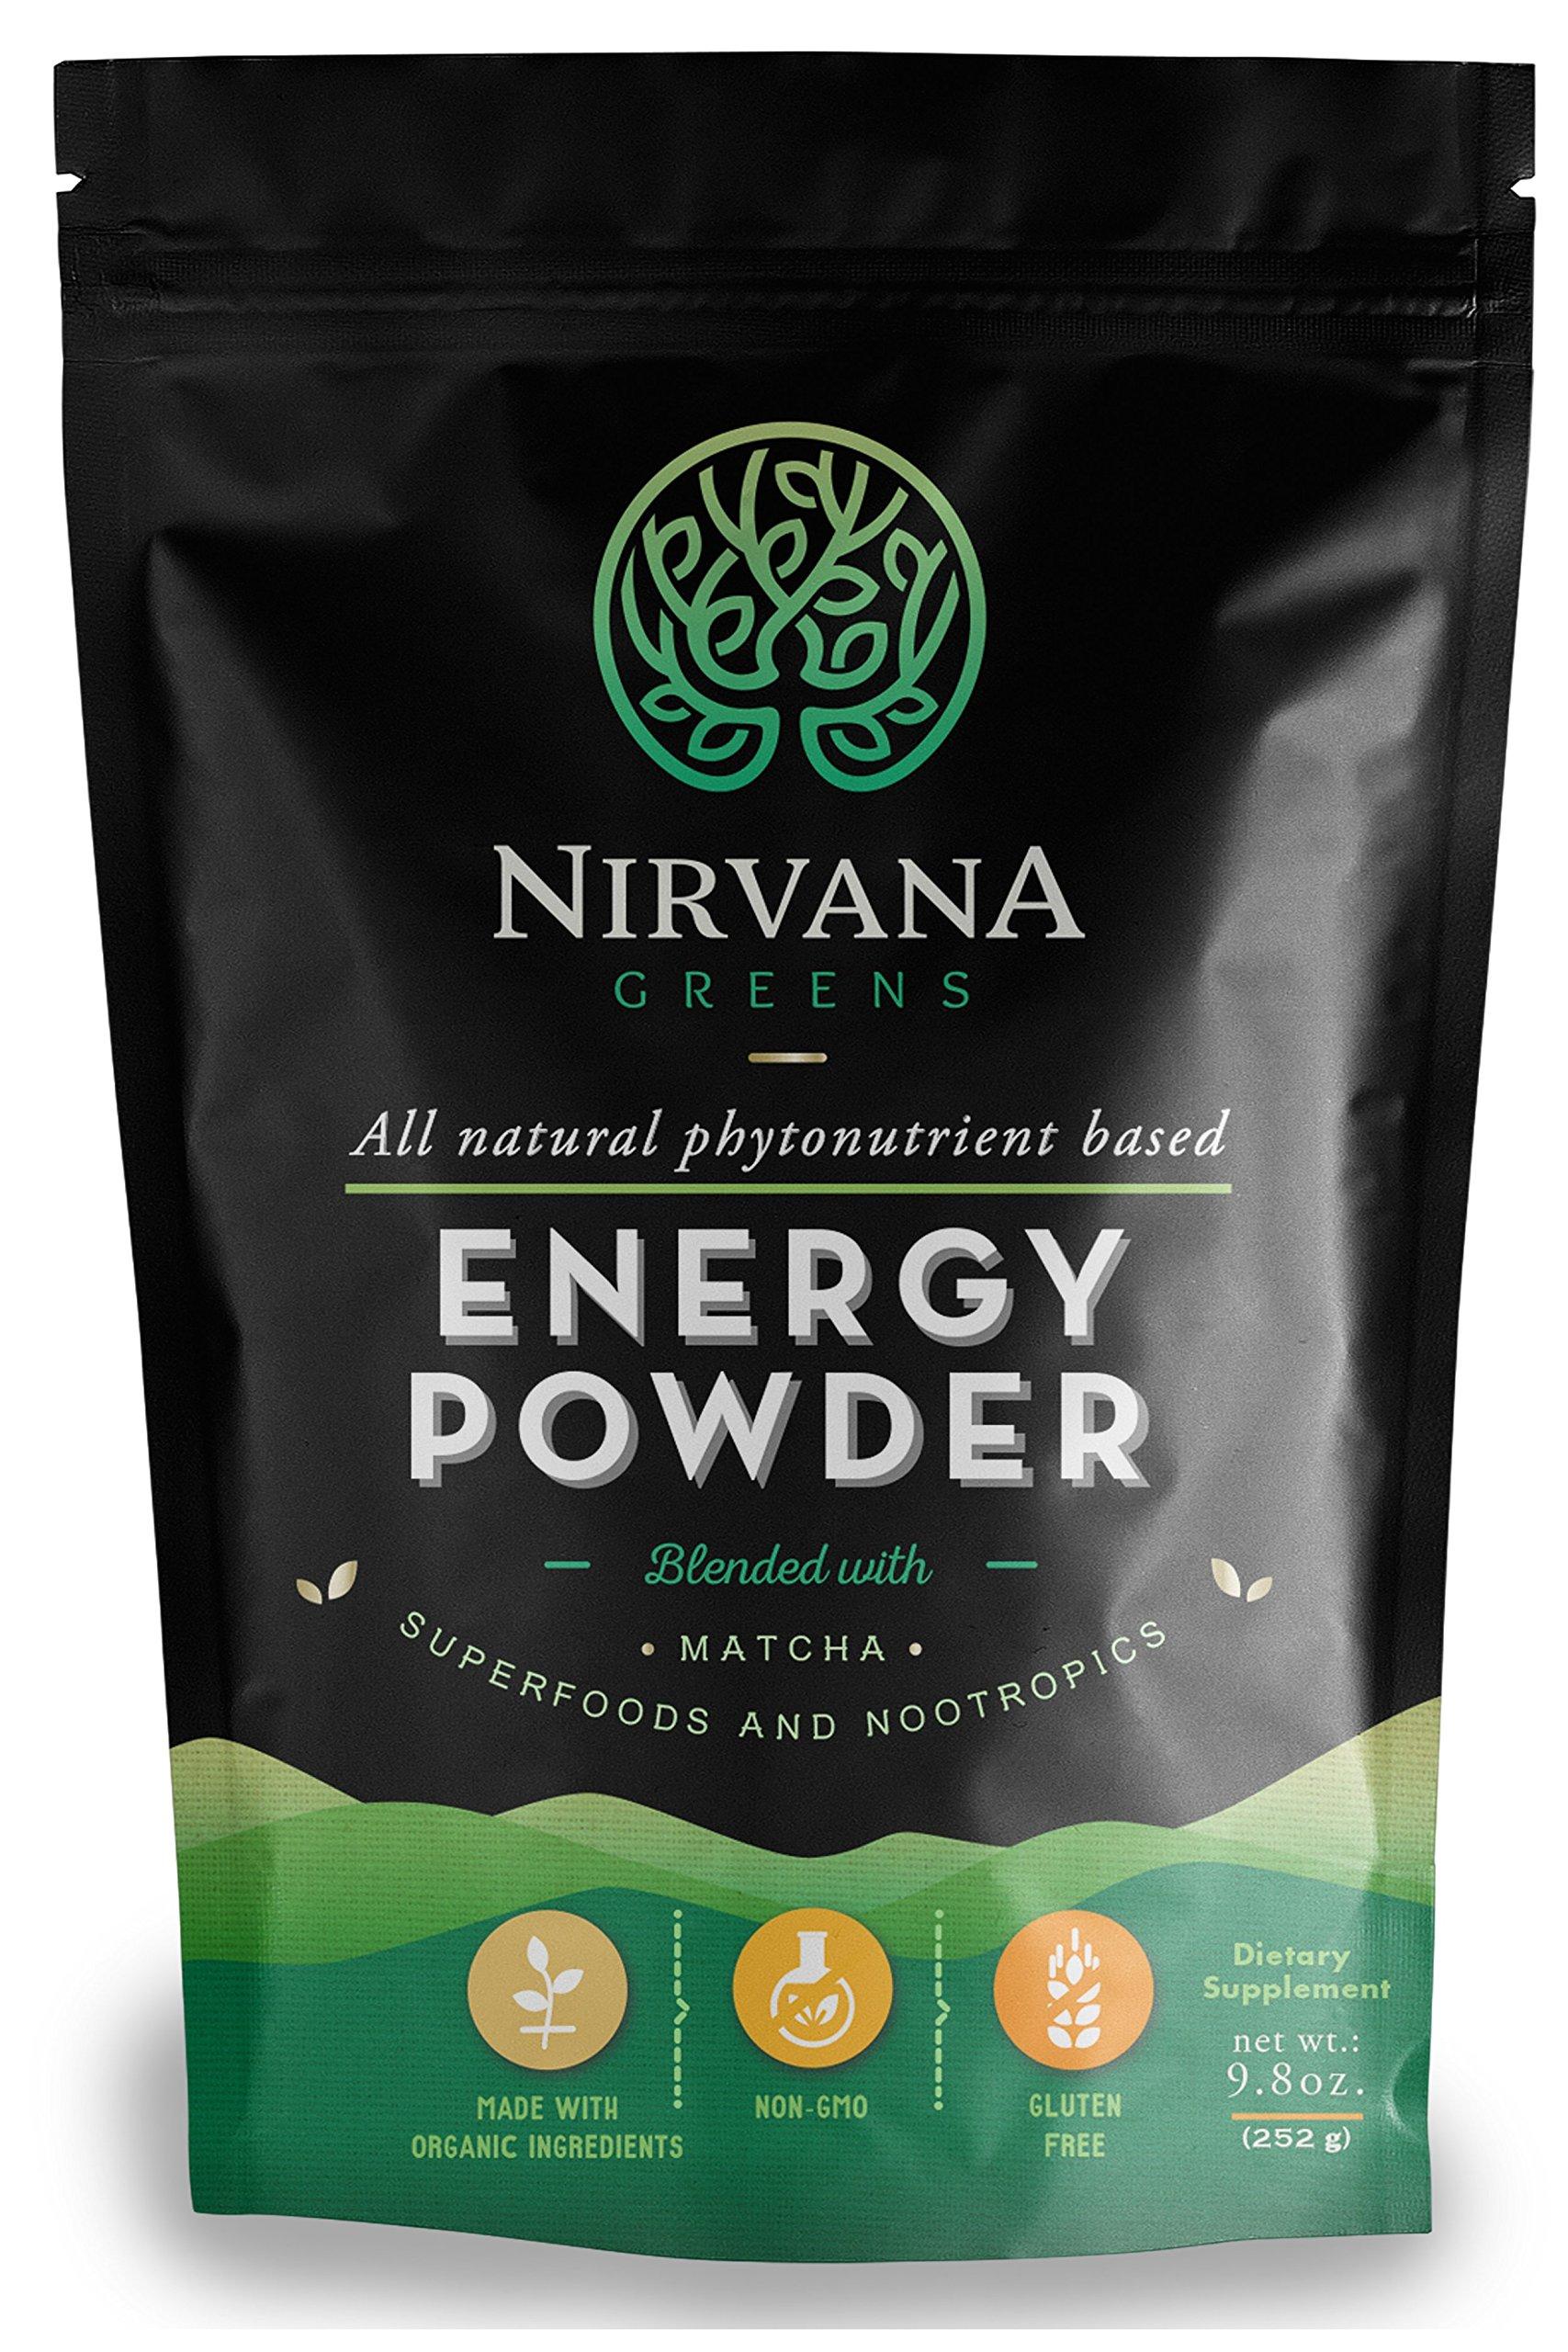 Nirvana Greens Superfood Energy Supplement - Organic Phytonutrient Based Energy Powder- 45 Servings - Matcha Spirulina Moringa with Cognitive Enhancers - Raw Gluten Free Vegan Alkalizing (9.8 oz)